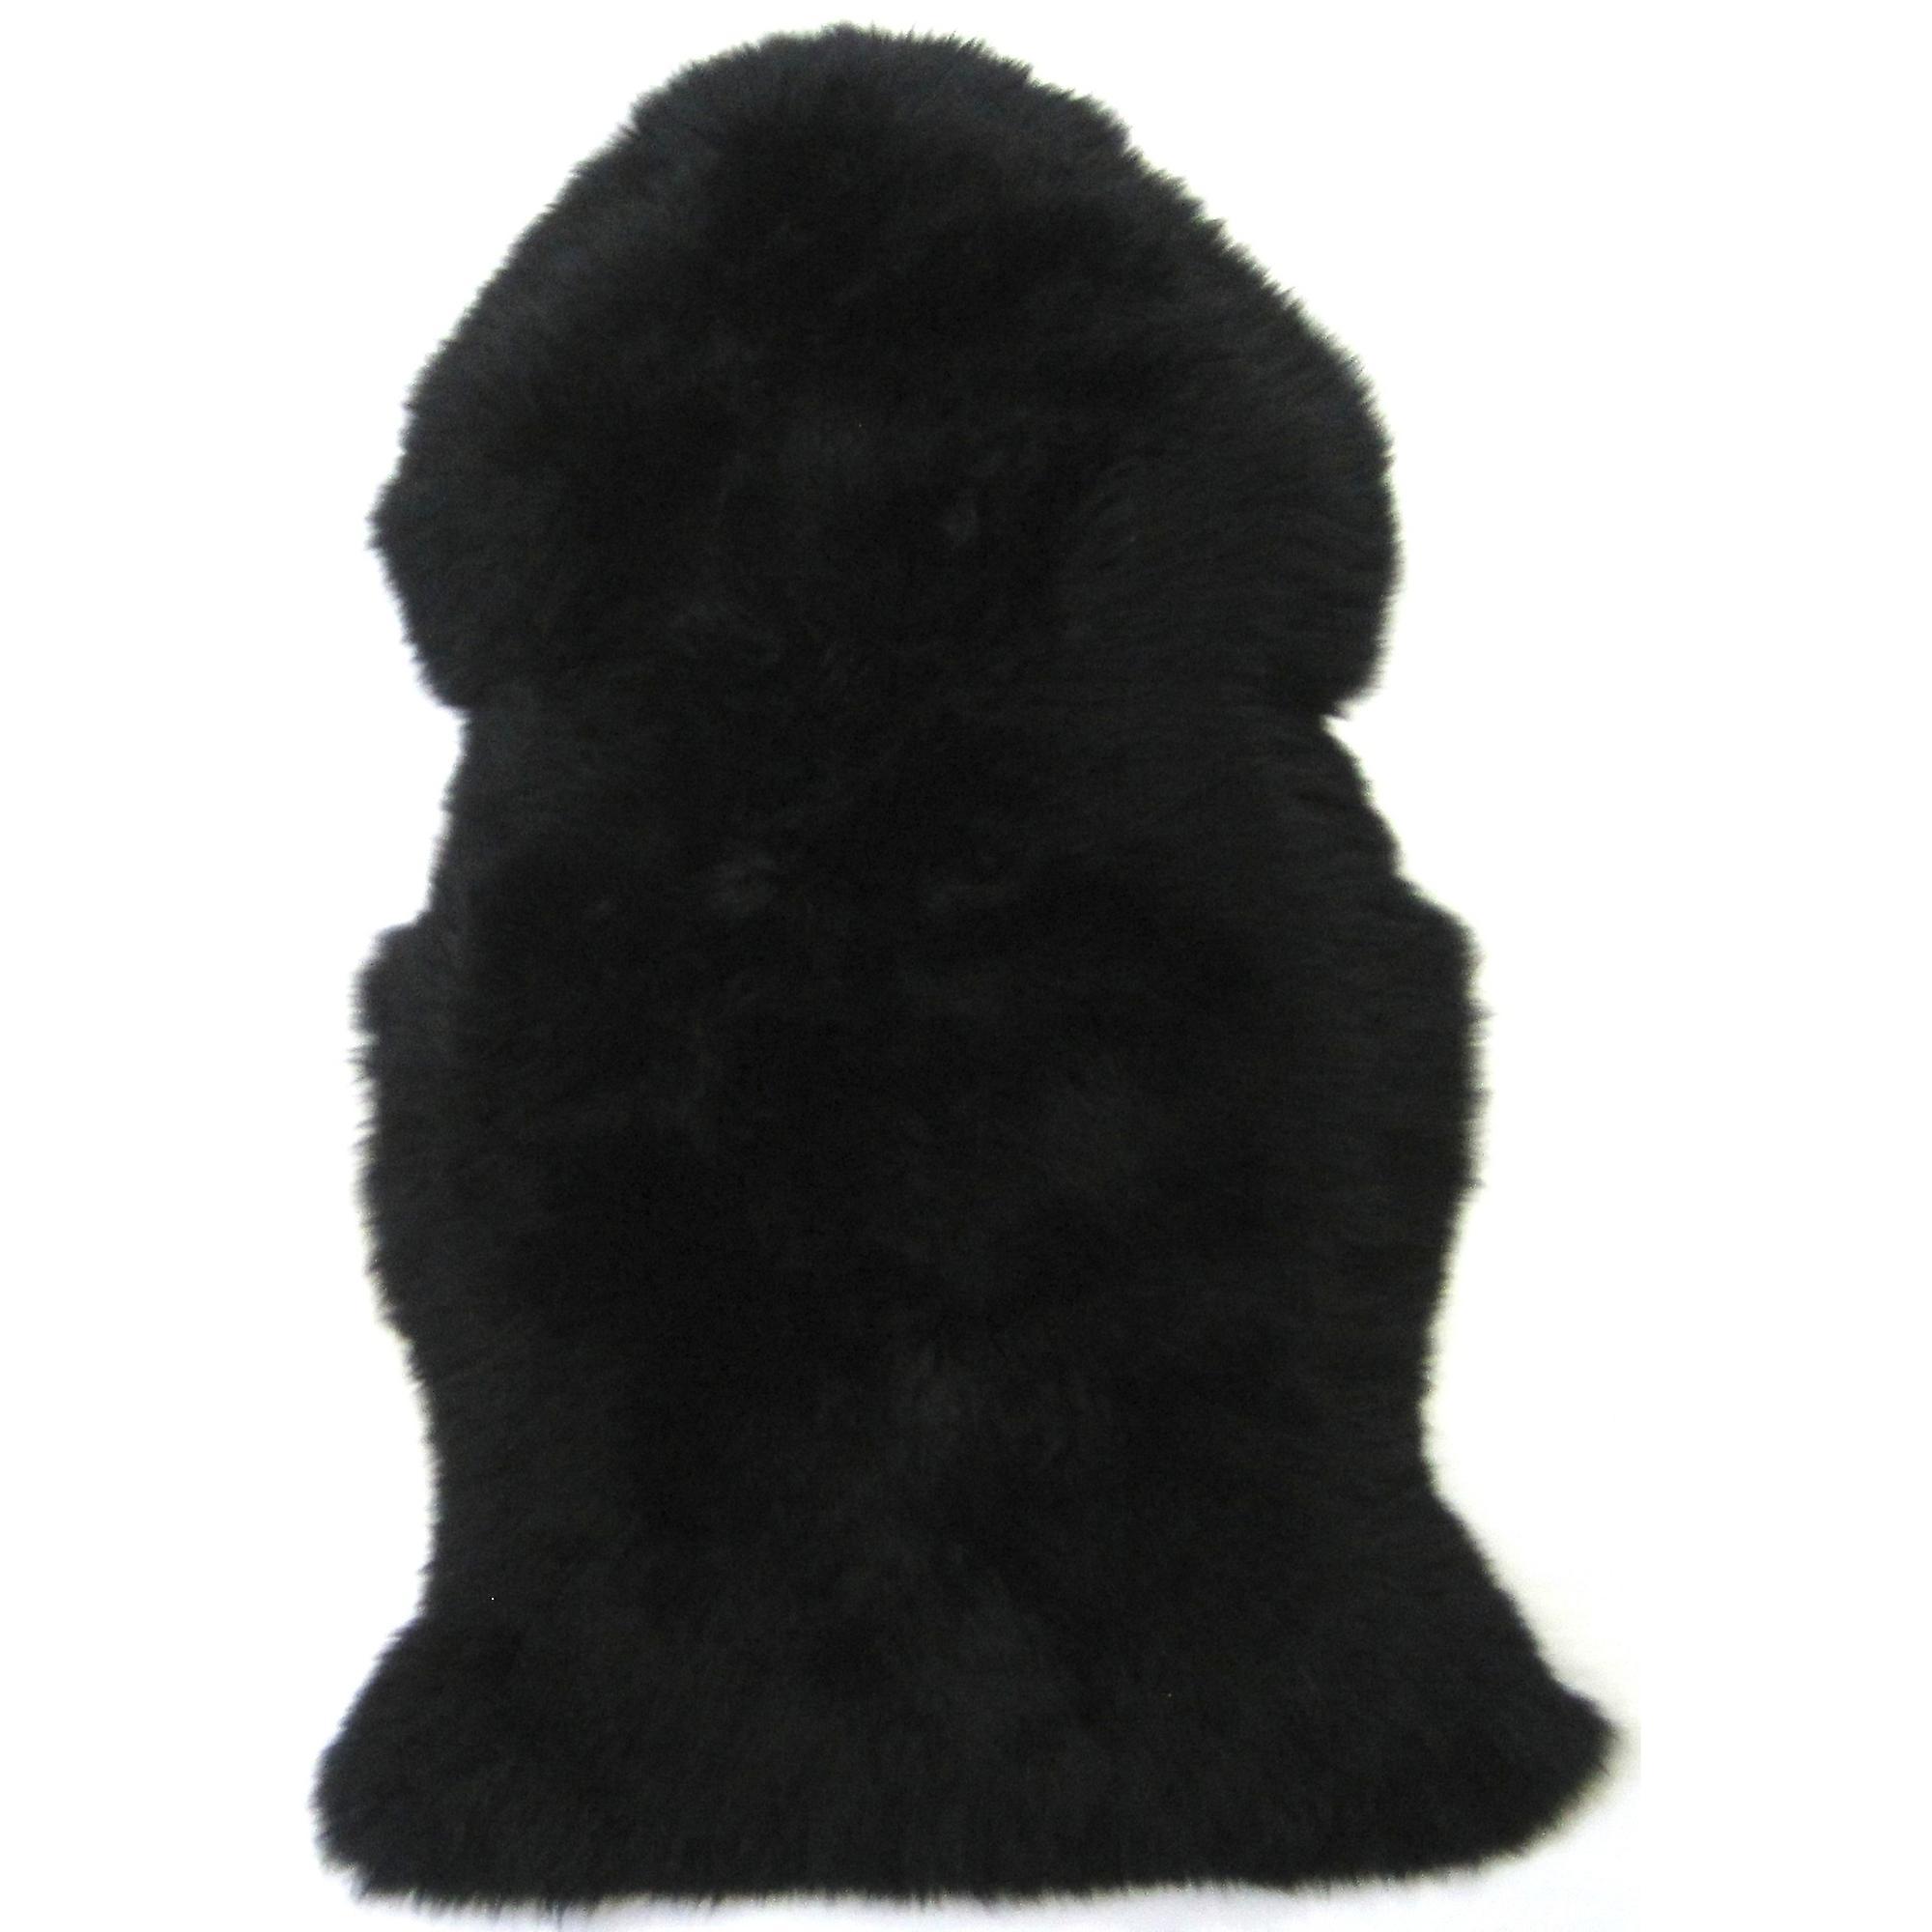 Snugrugs Jet Black Sheepskin Rug